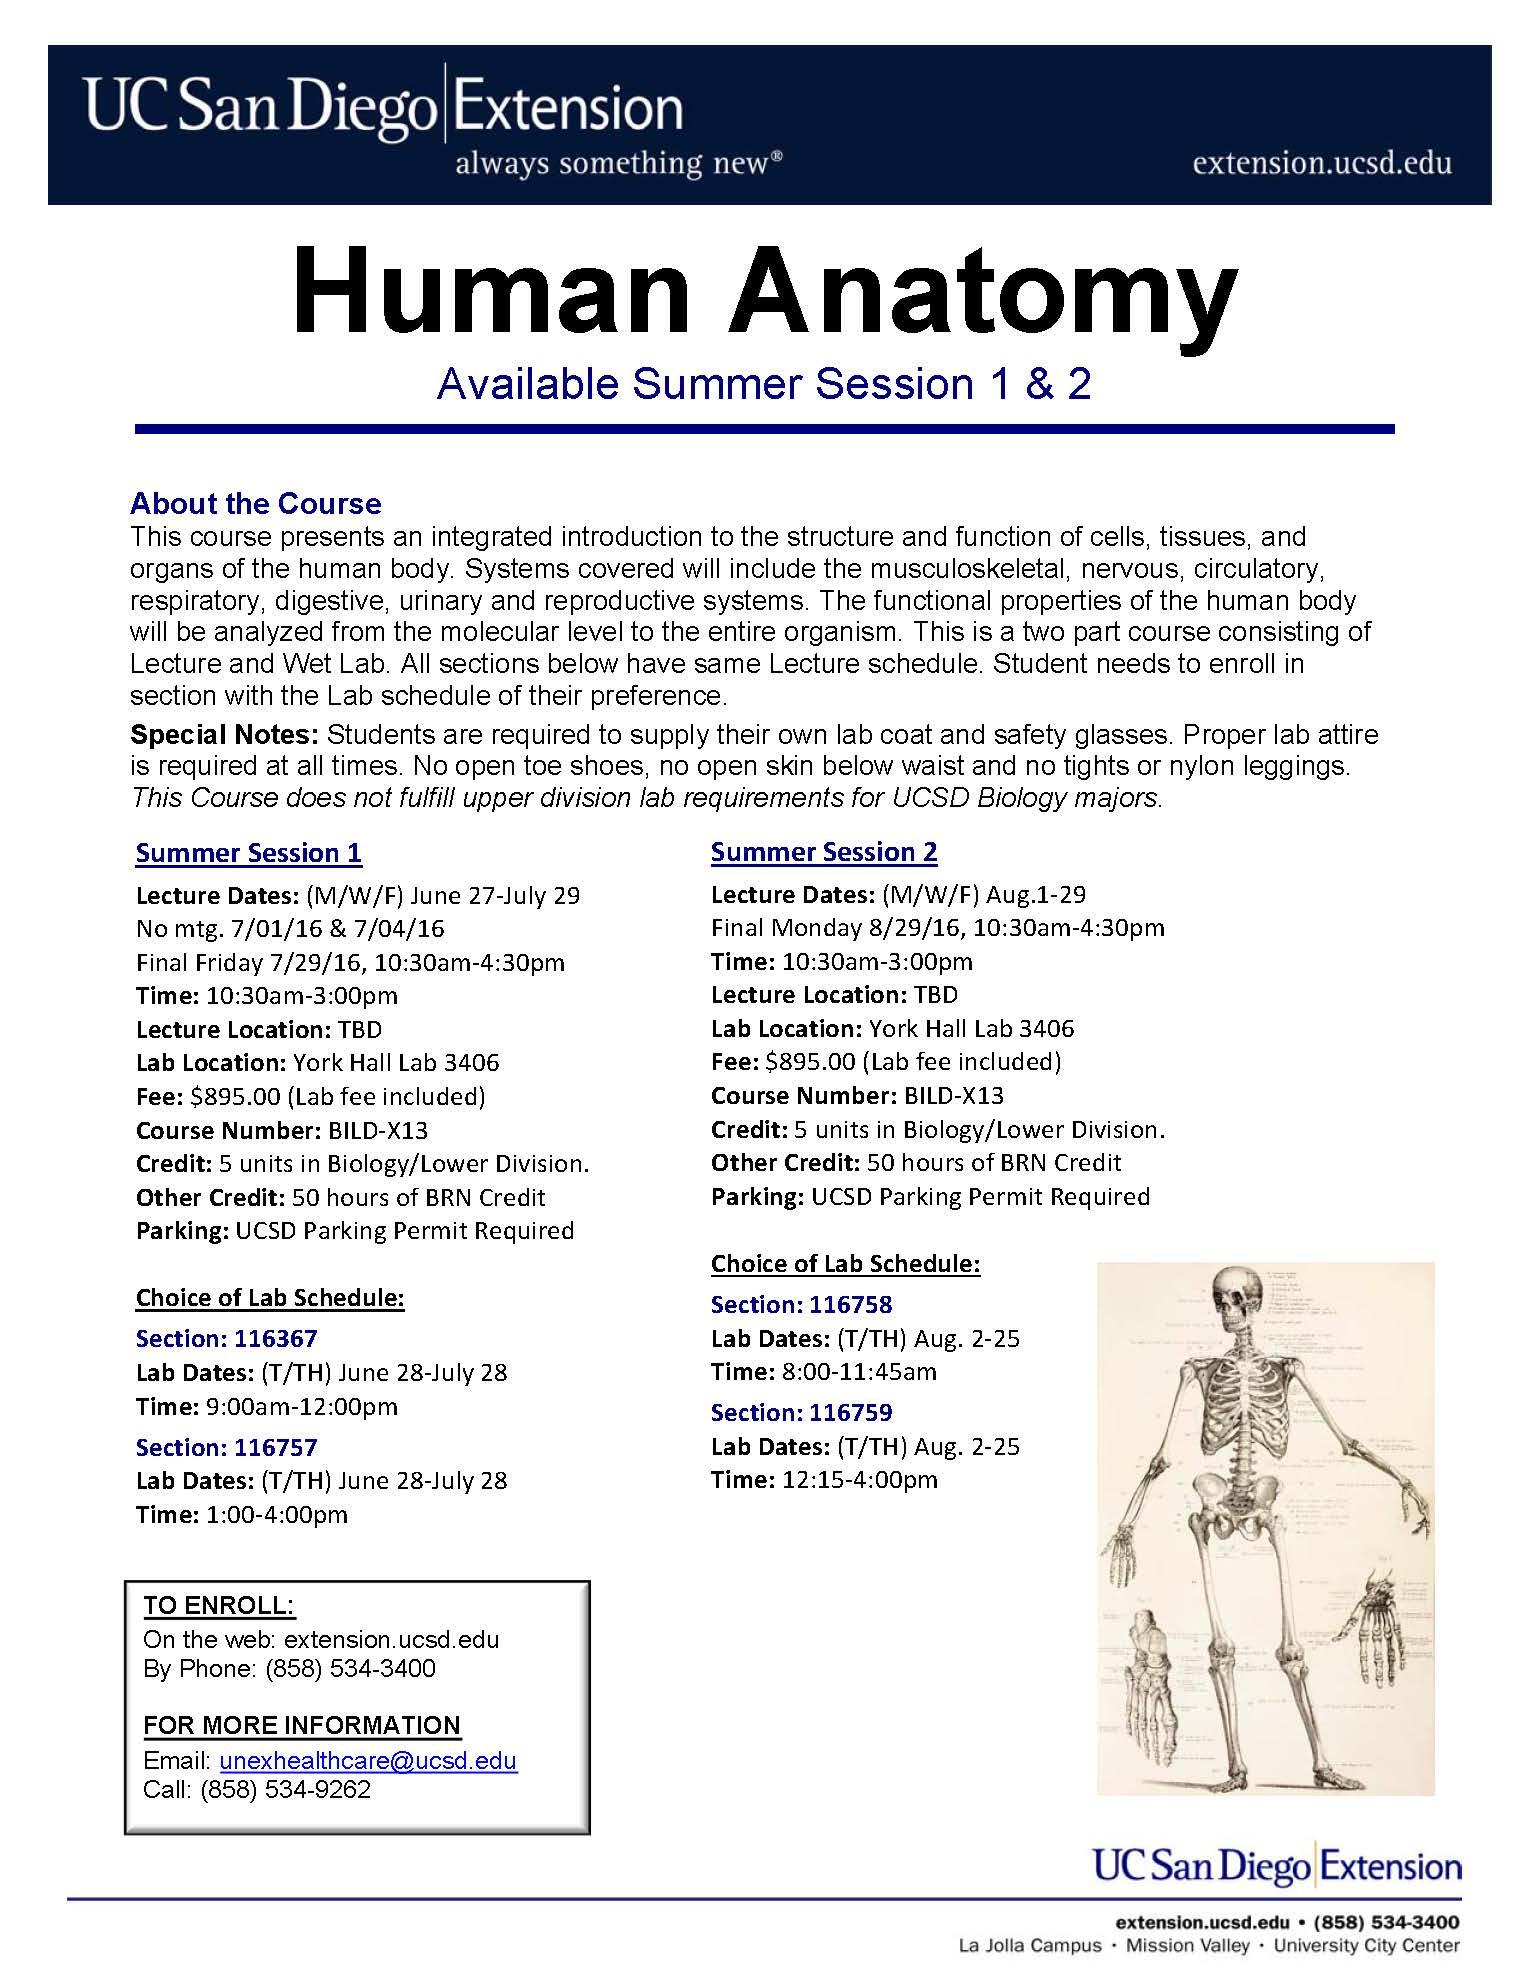 Human Anatomy Flyer SU16 | UC San Diego - Biology Bulletin